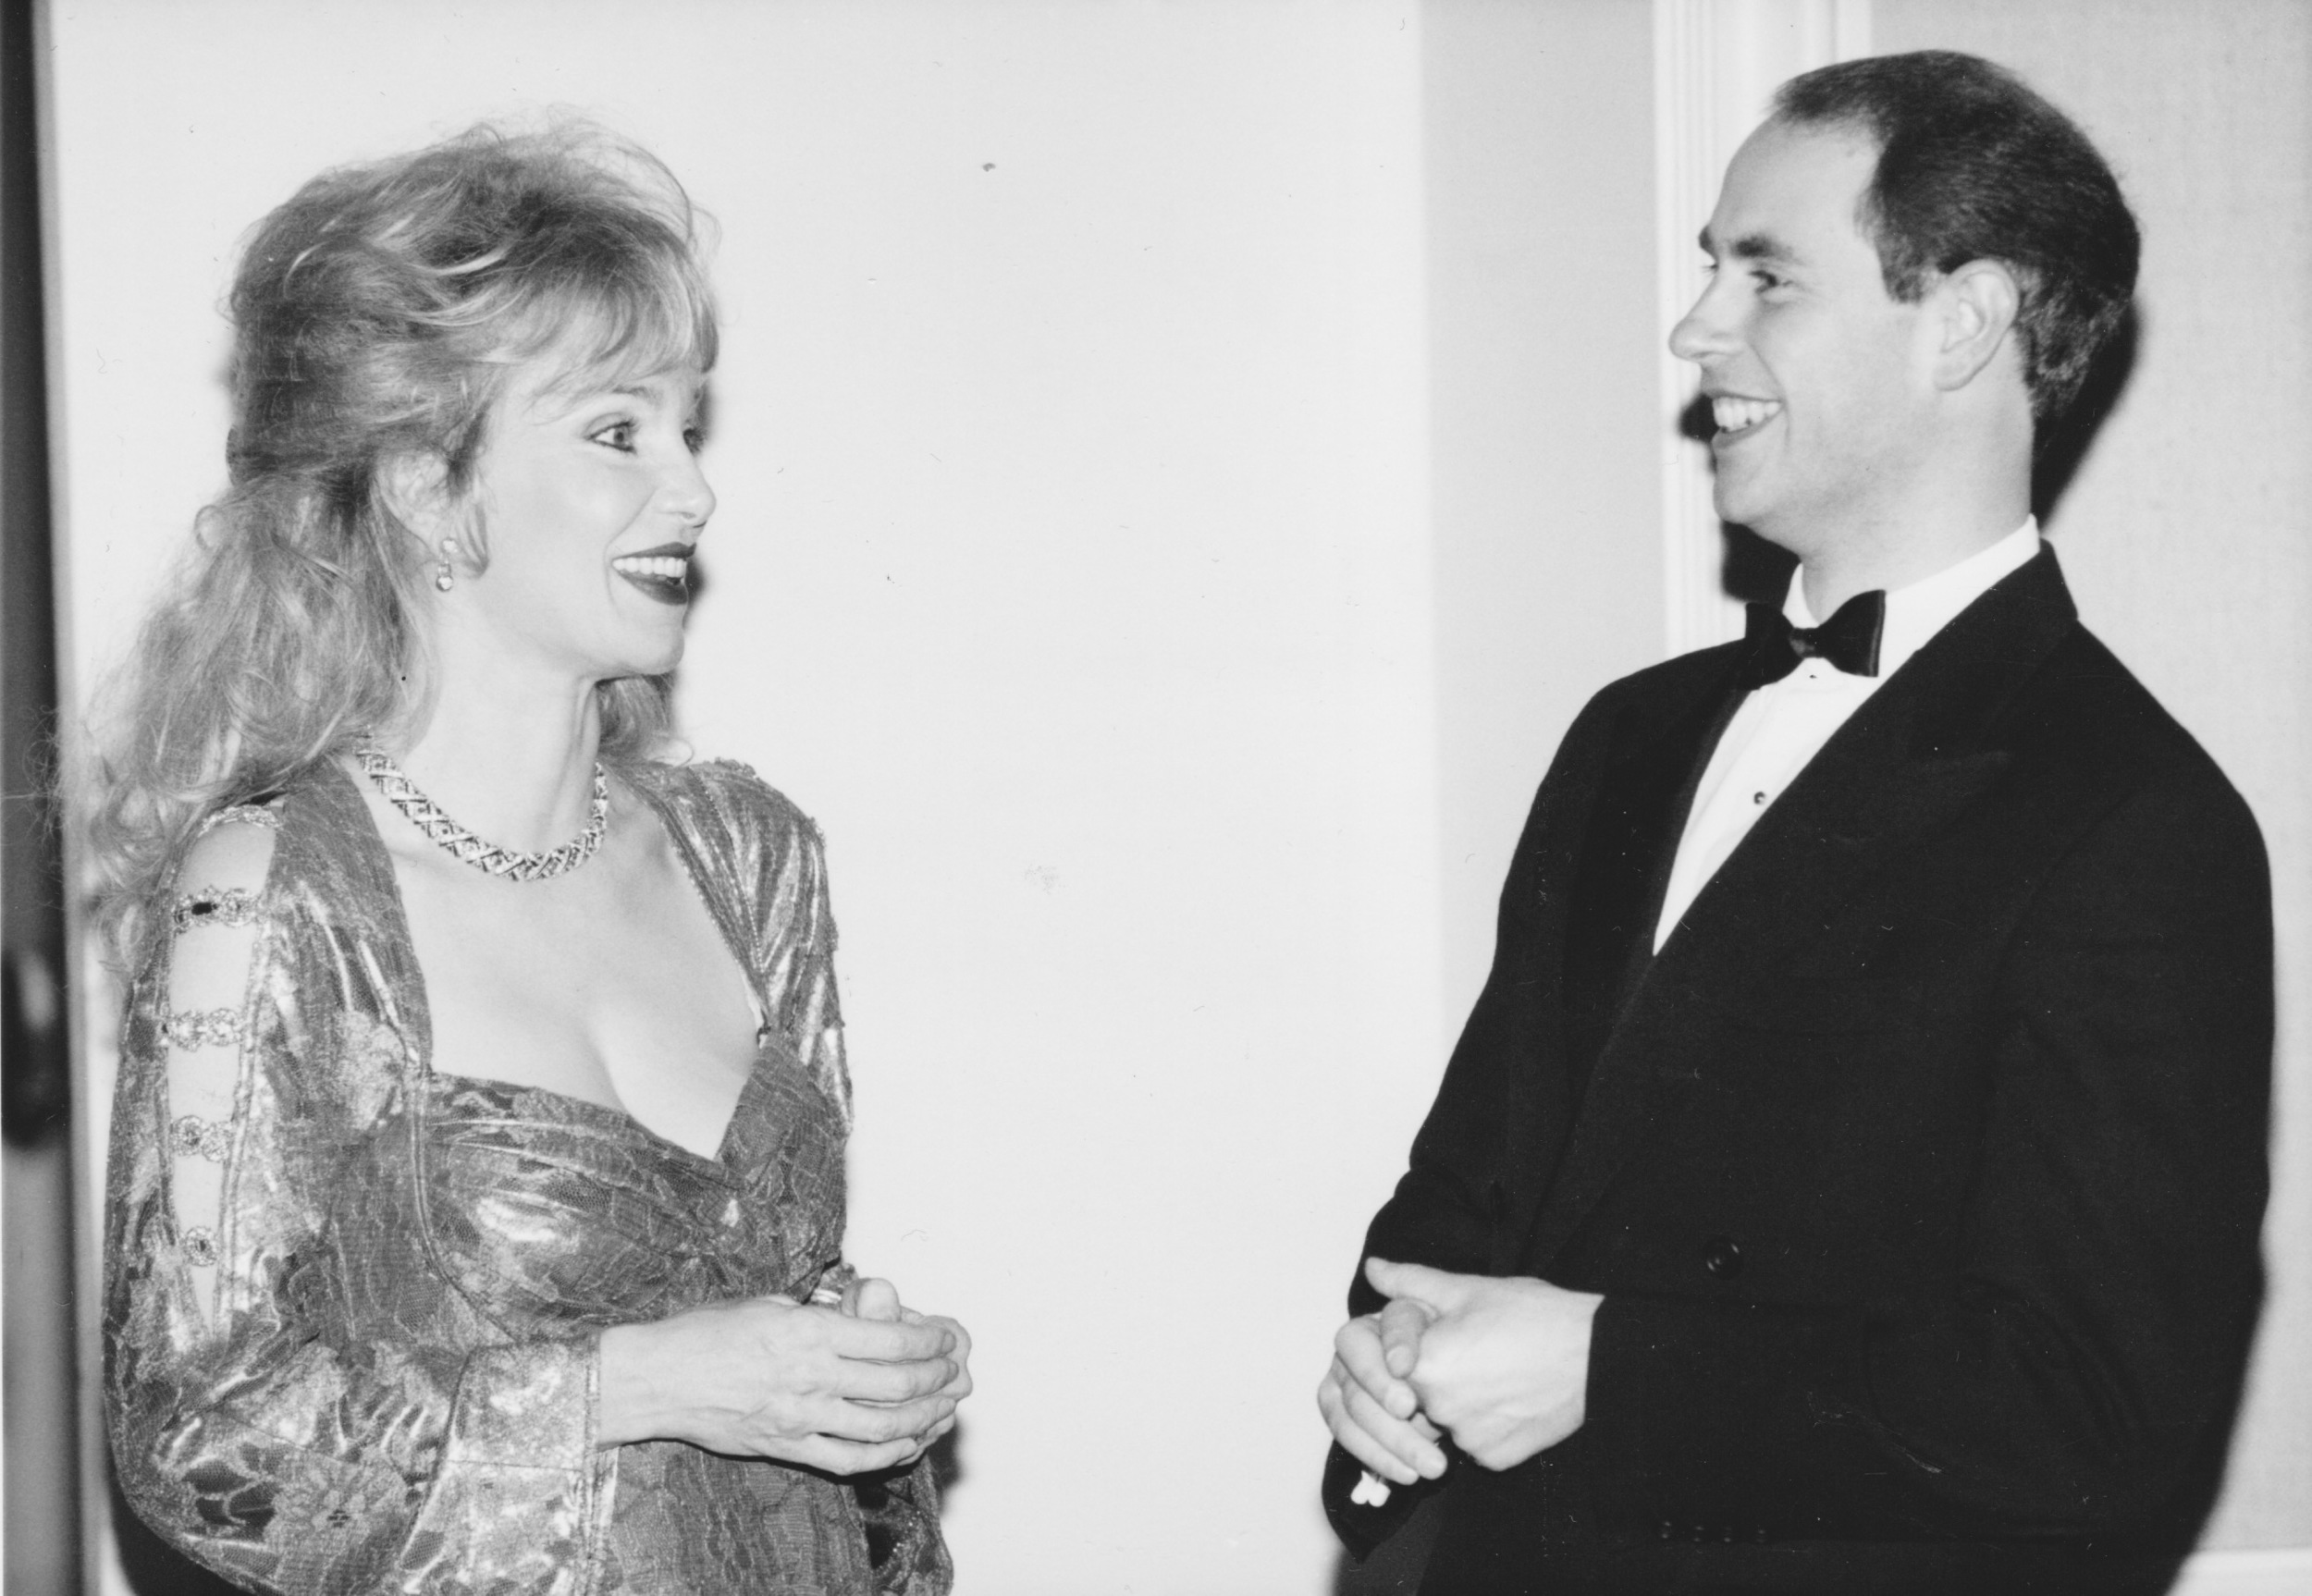 1995 with Prince Edward